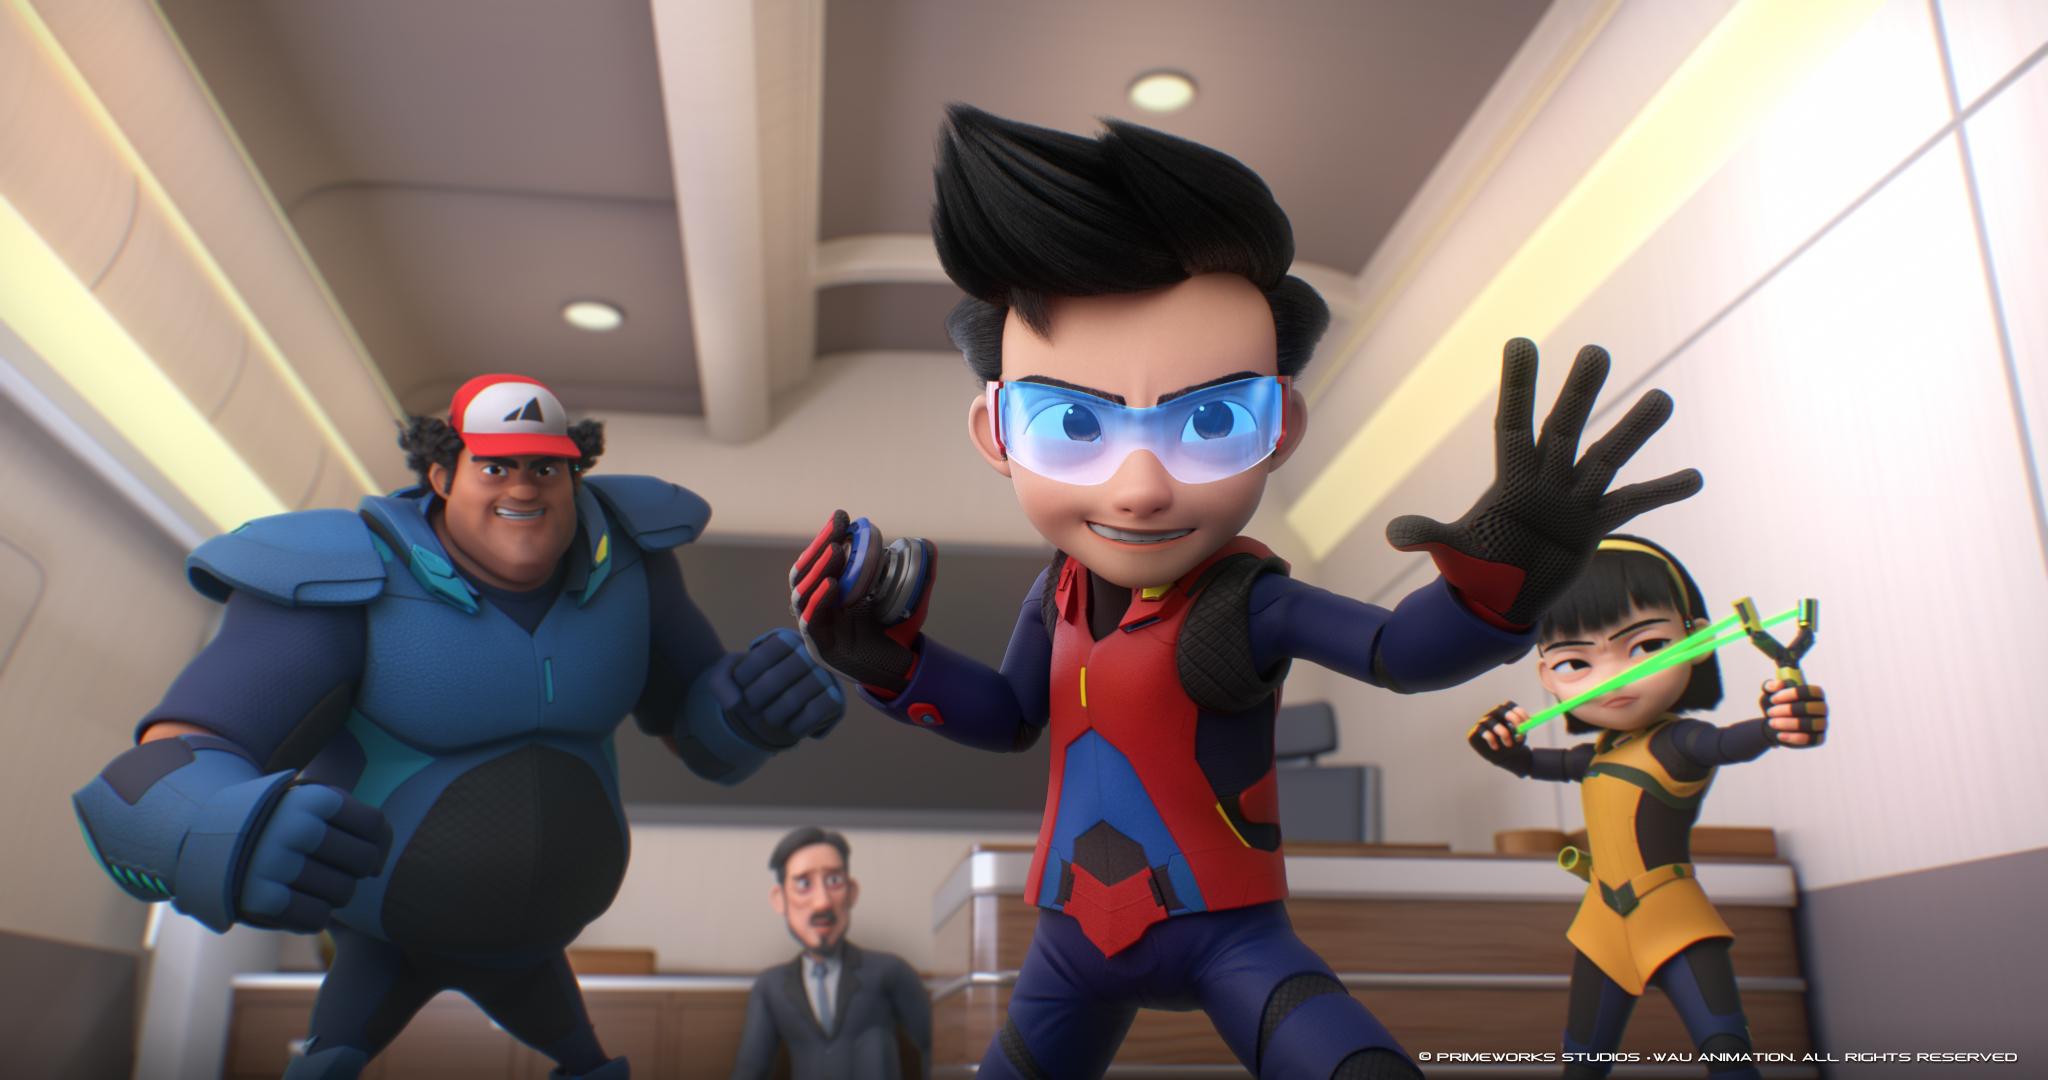 Image from Primeworks Studios